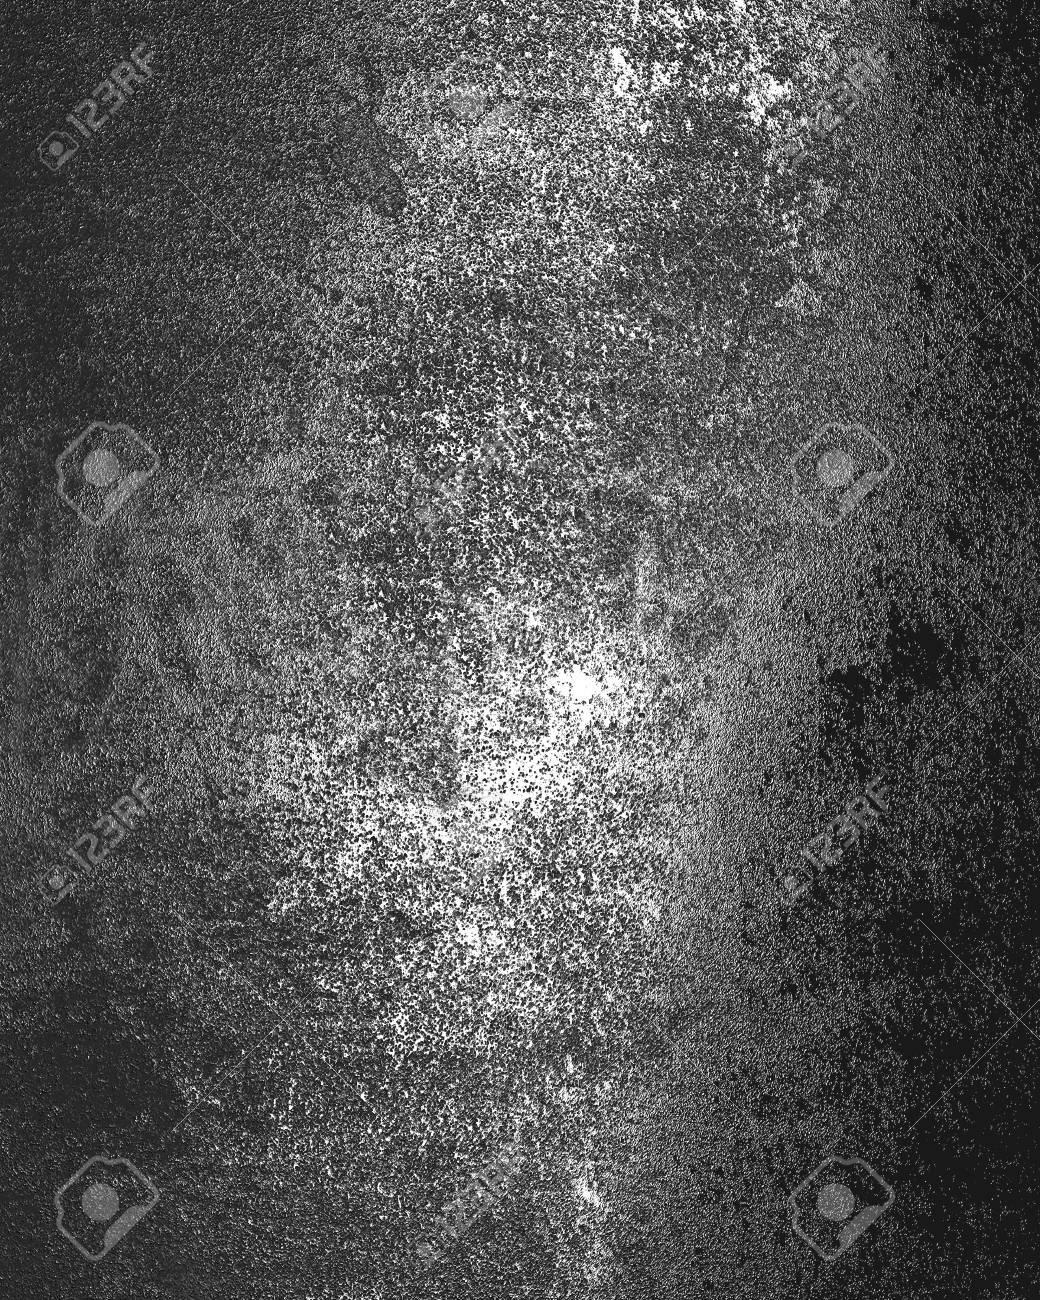 grunge iron textured background Stock Photo - 17837468